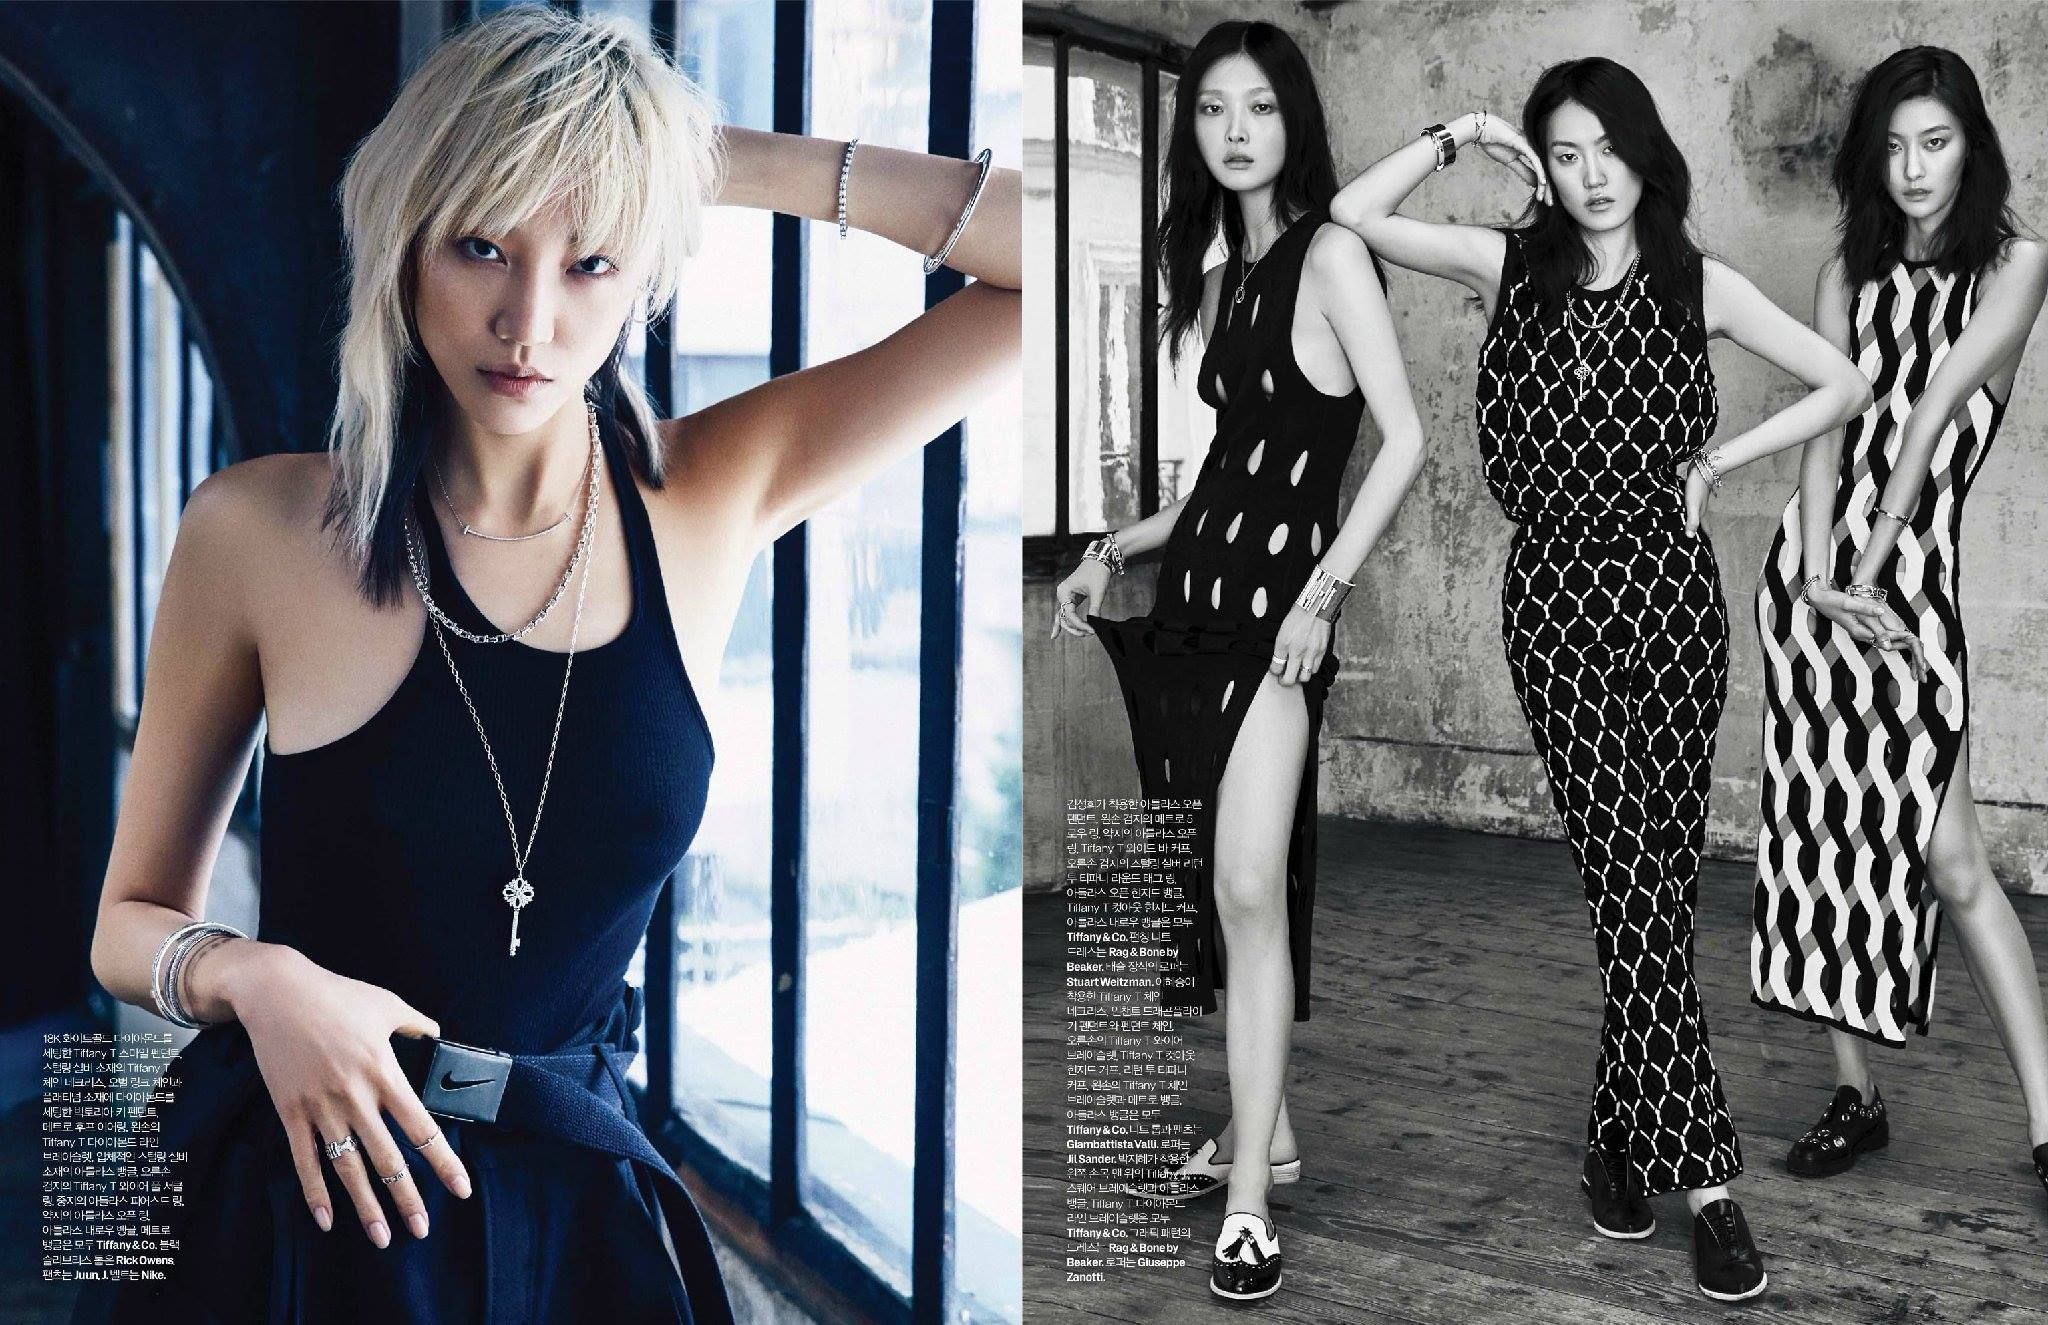 Video Soo Joo Park nudes (81 photo), Topless, Is a cute, Selfie, butt 2006